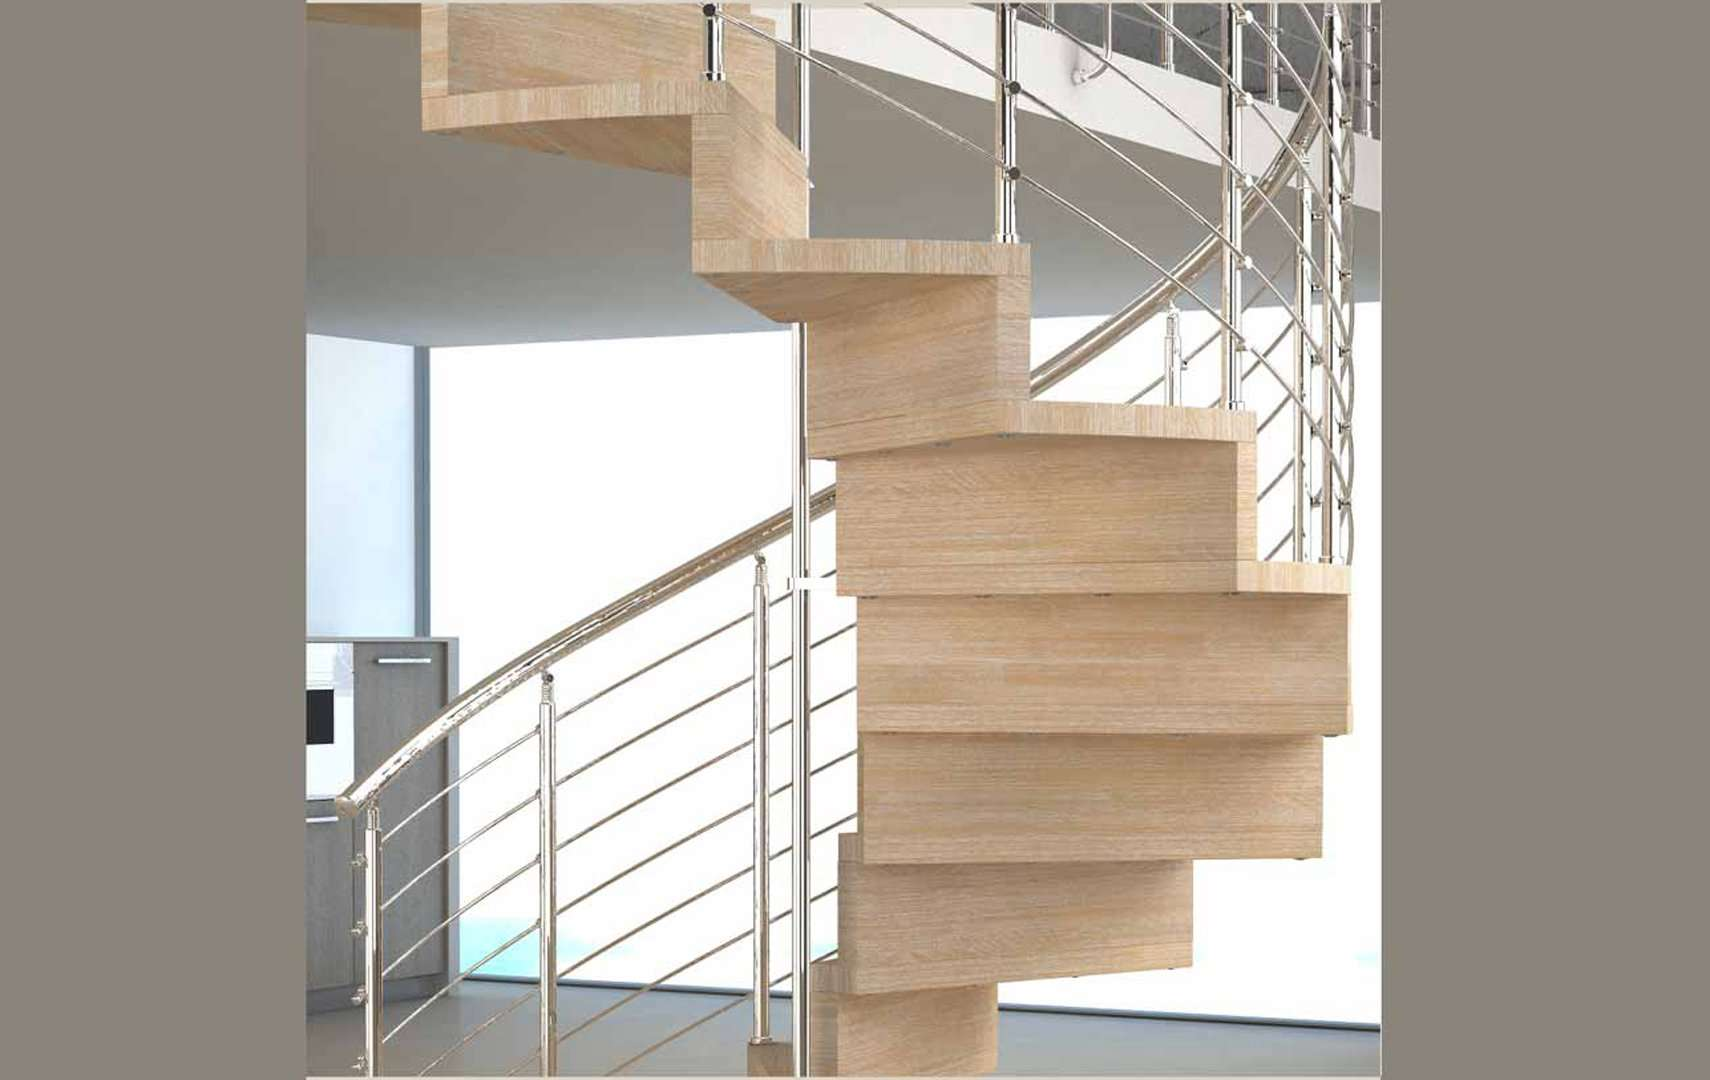 Escaleras exteriores de madera trendy carril para - Barandillas de madera para exterior ...